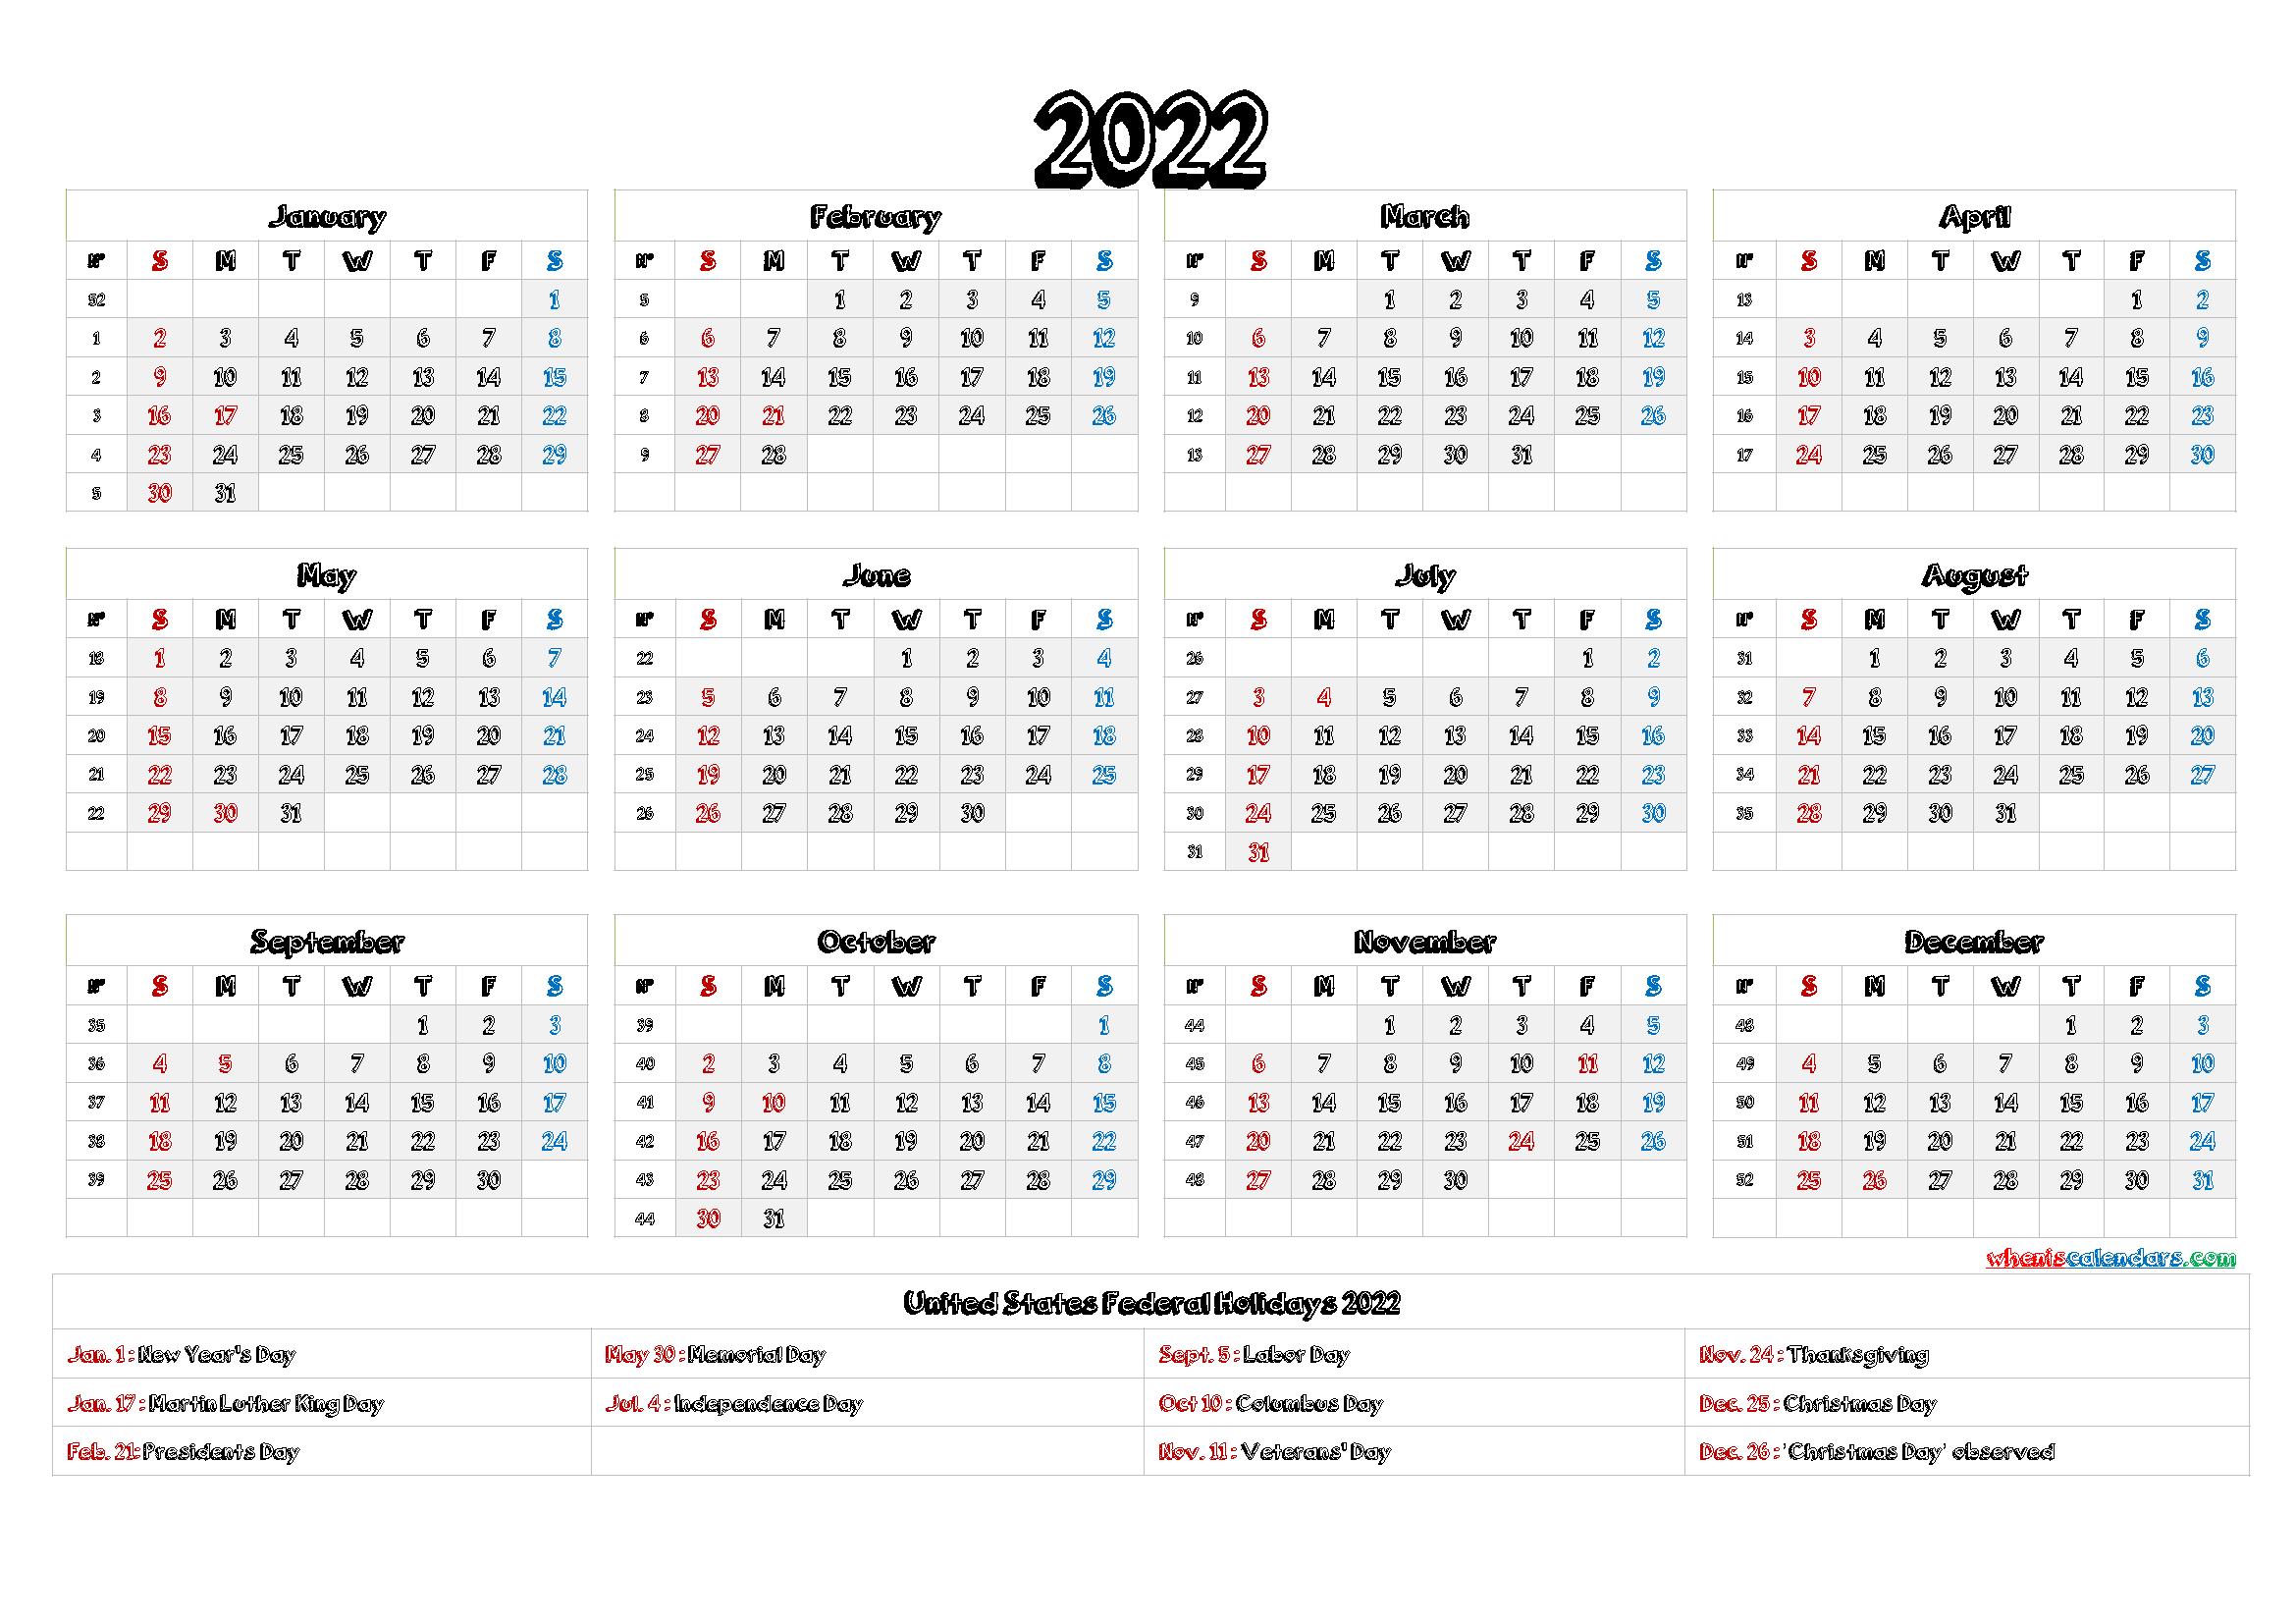 2022 Calendar With Holidays Printable - 9 Templates